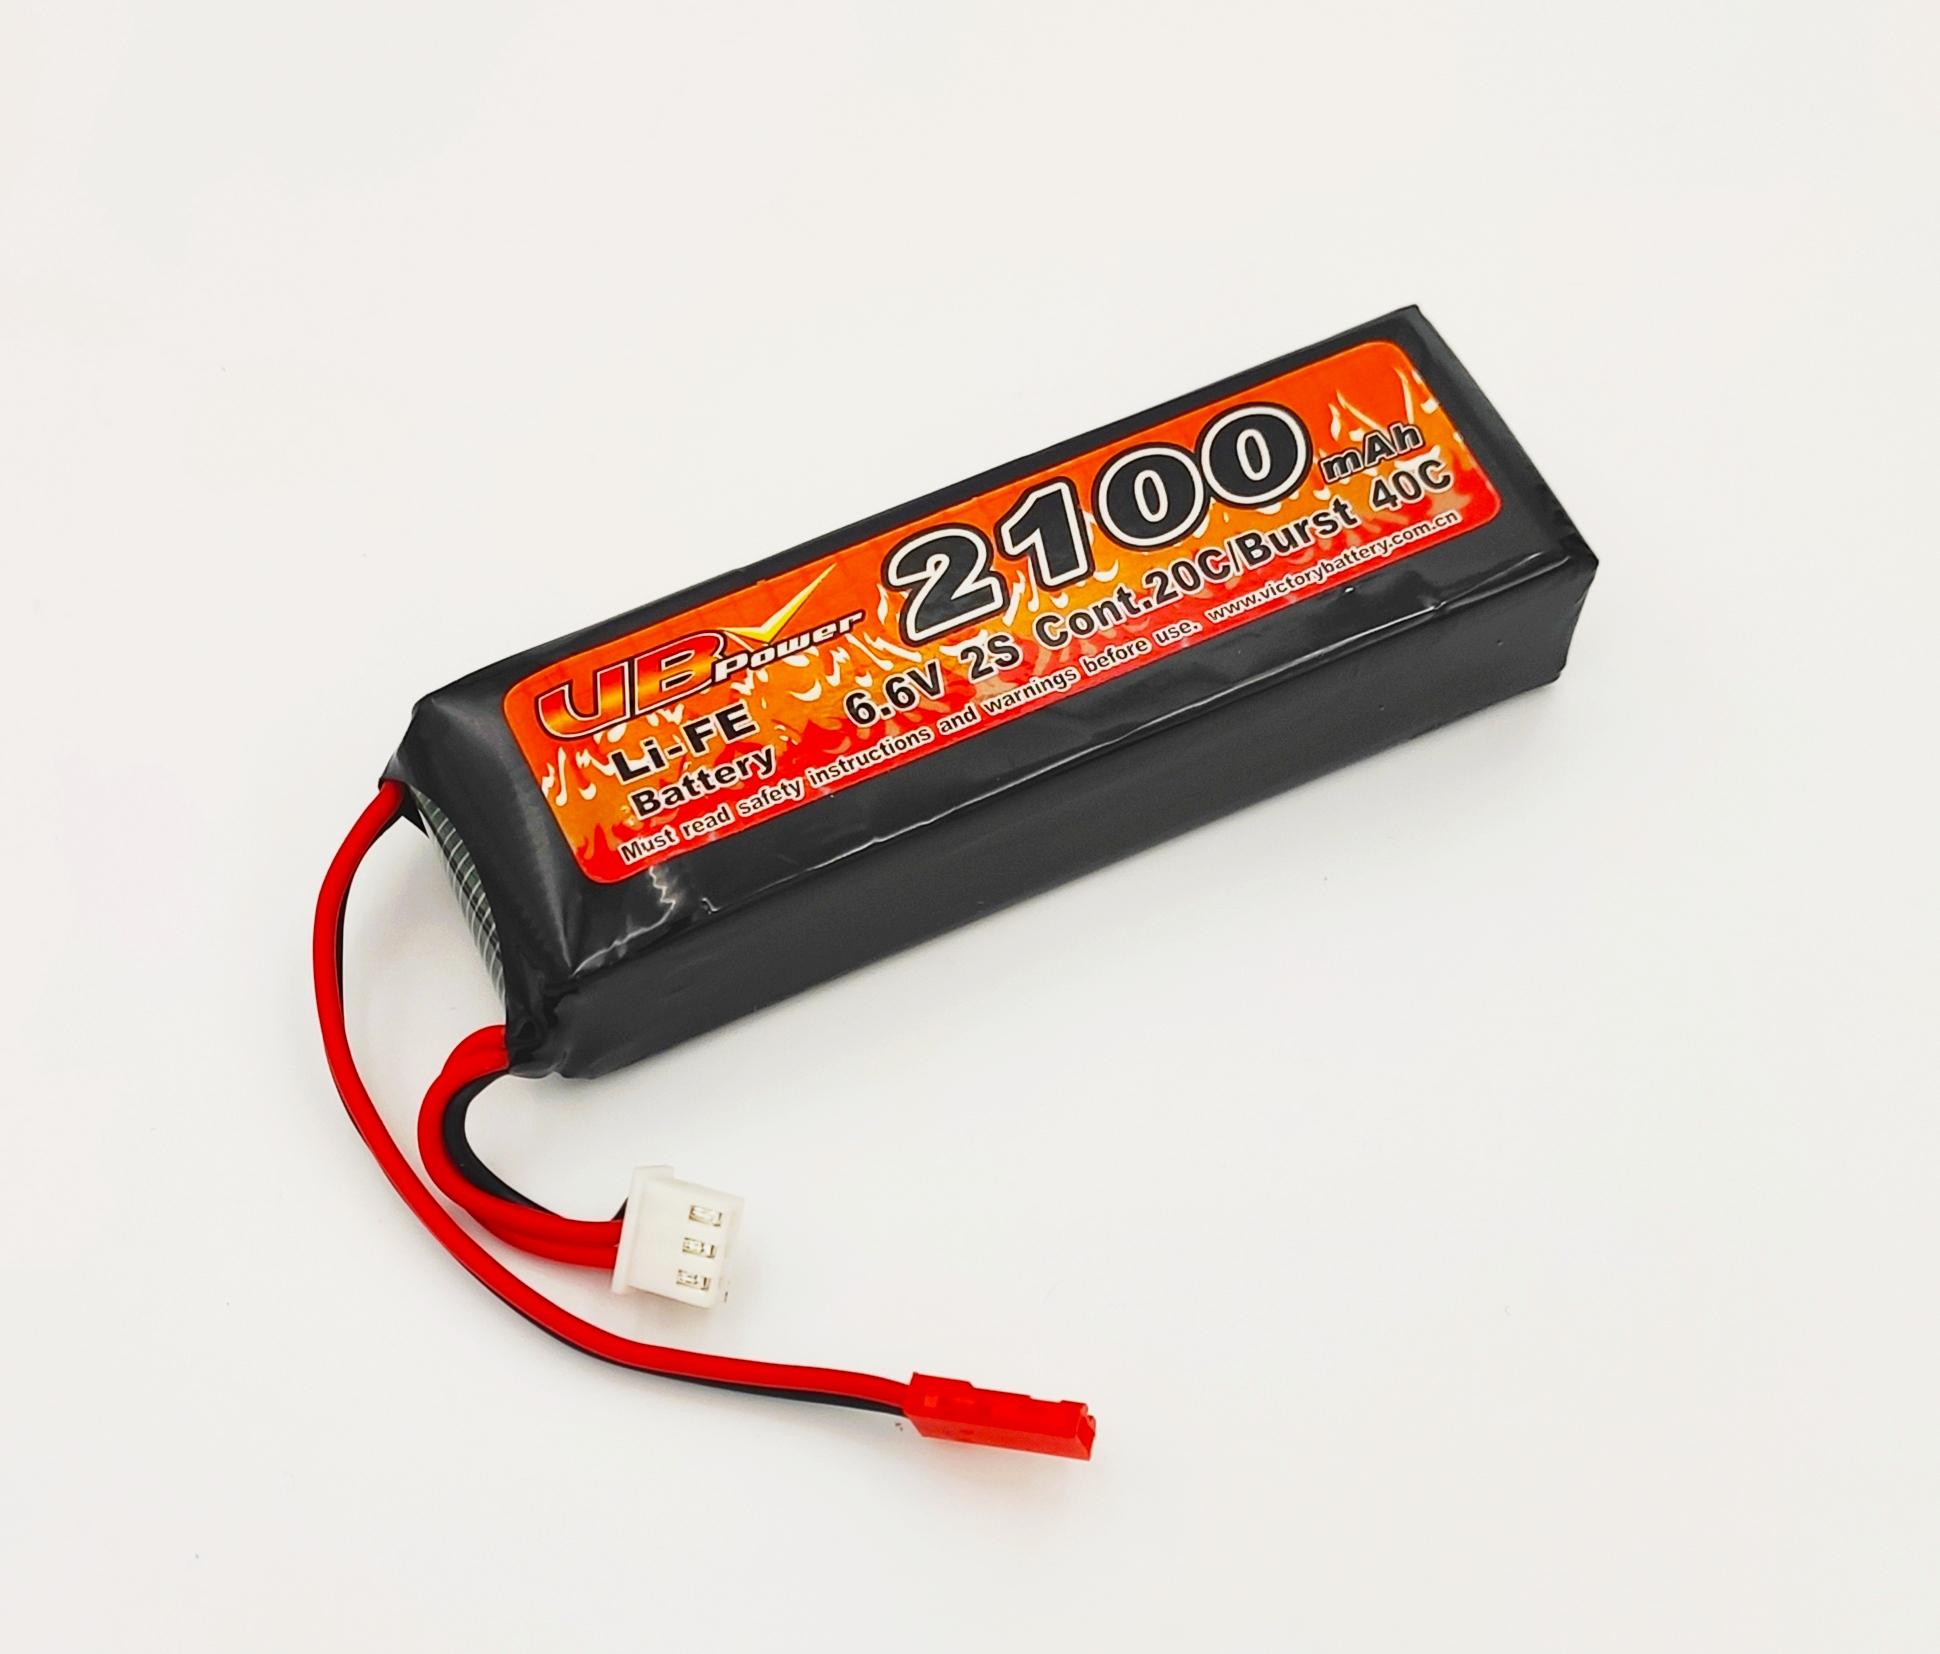 Аккубулятор для бортового питания LiFiPO4 2100mA/h, 6.6V